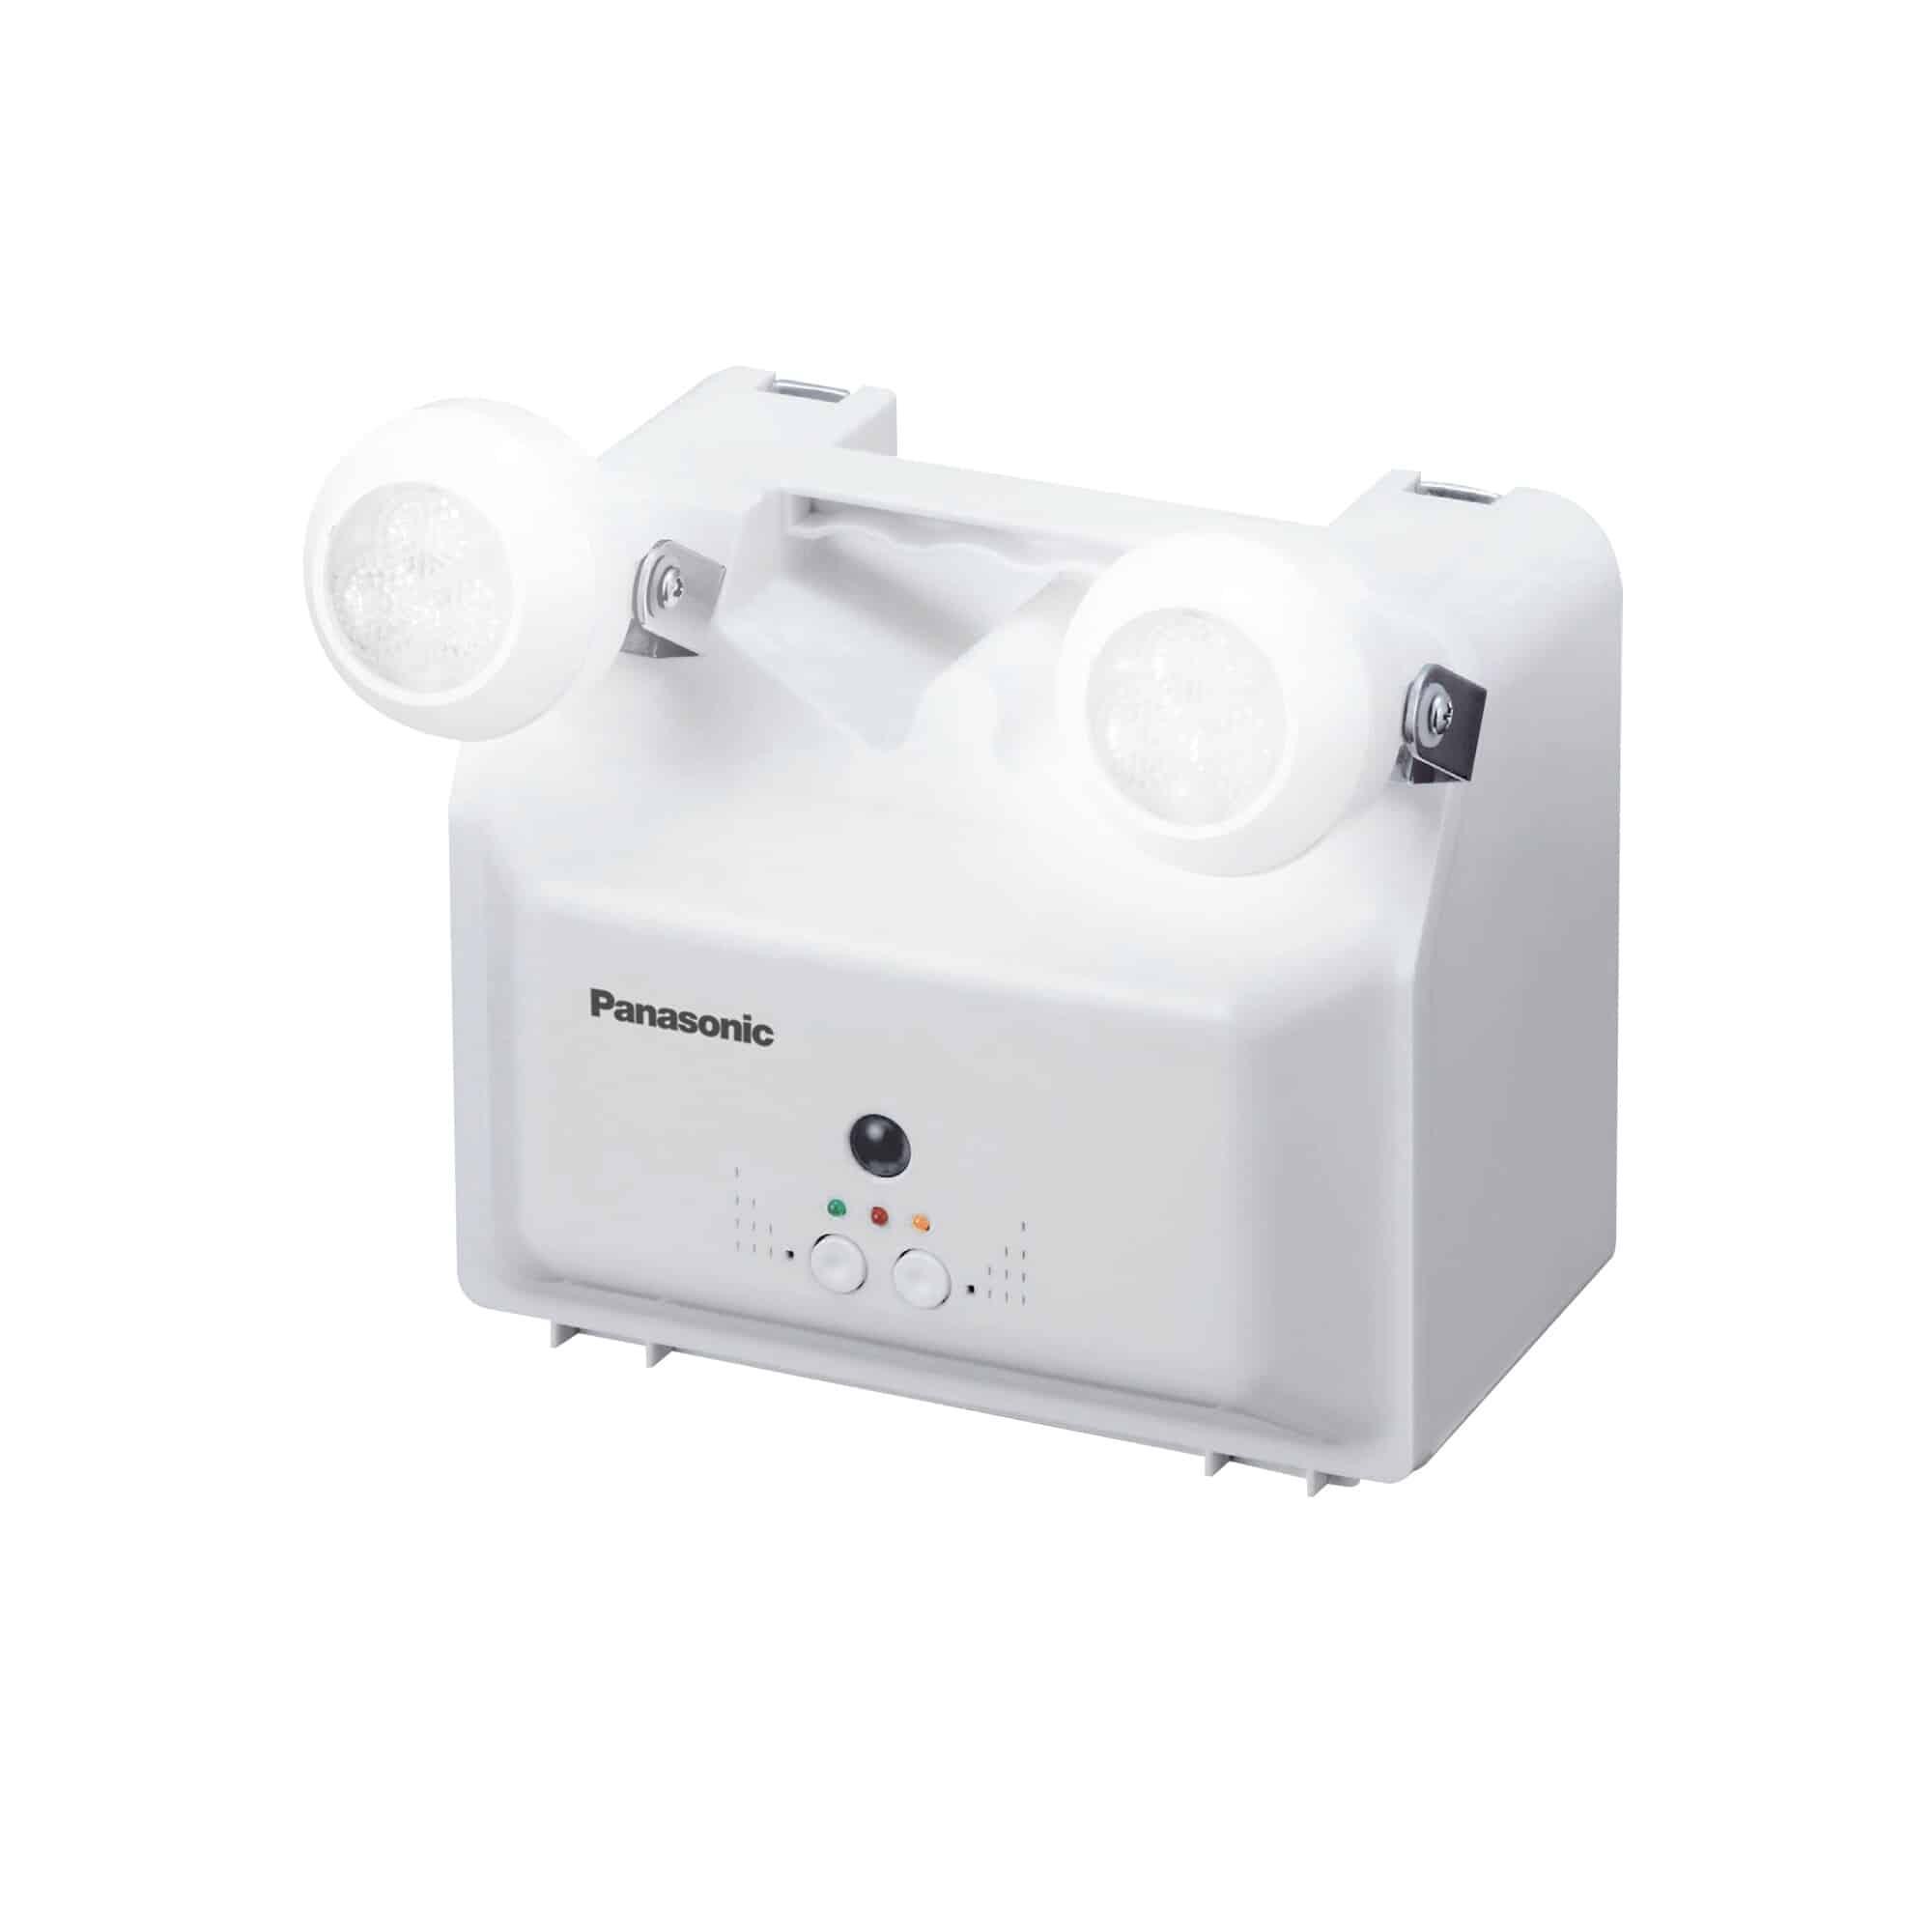 Panasonic-LDR400N